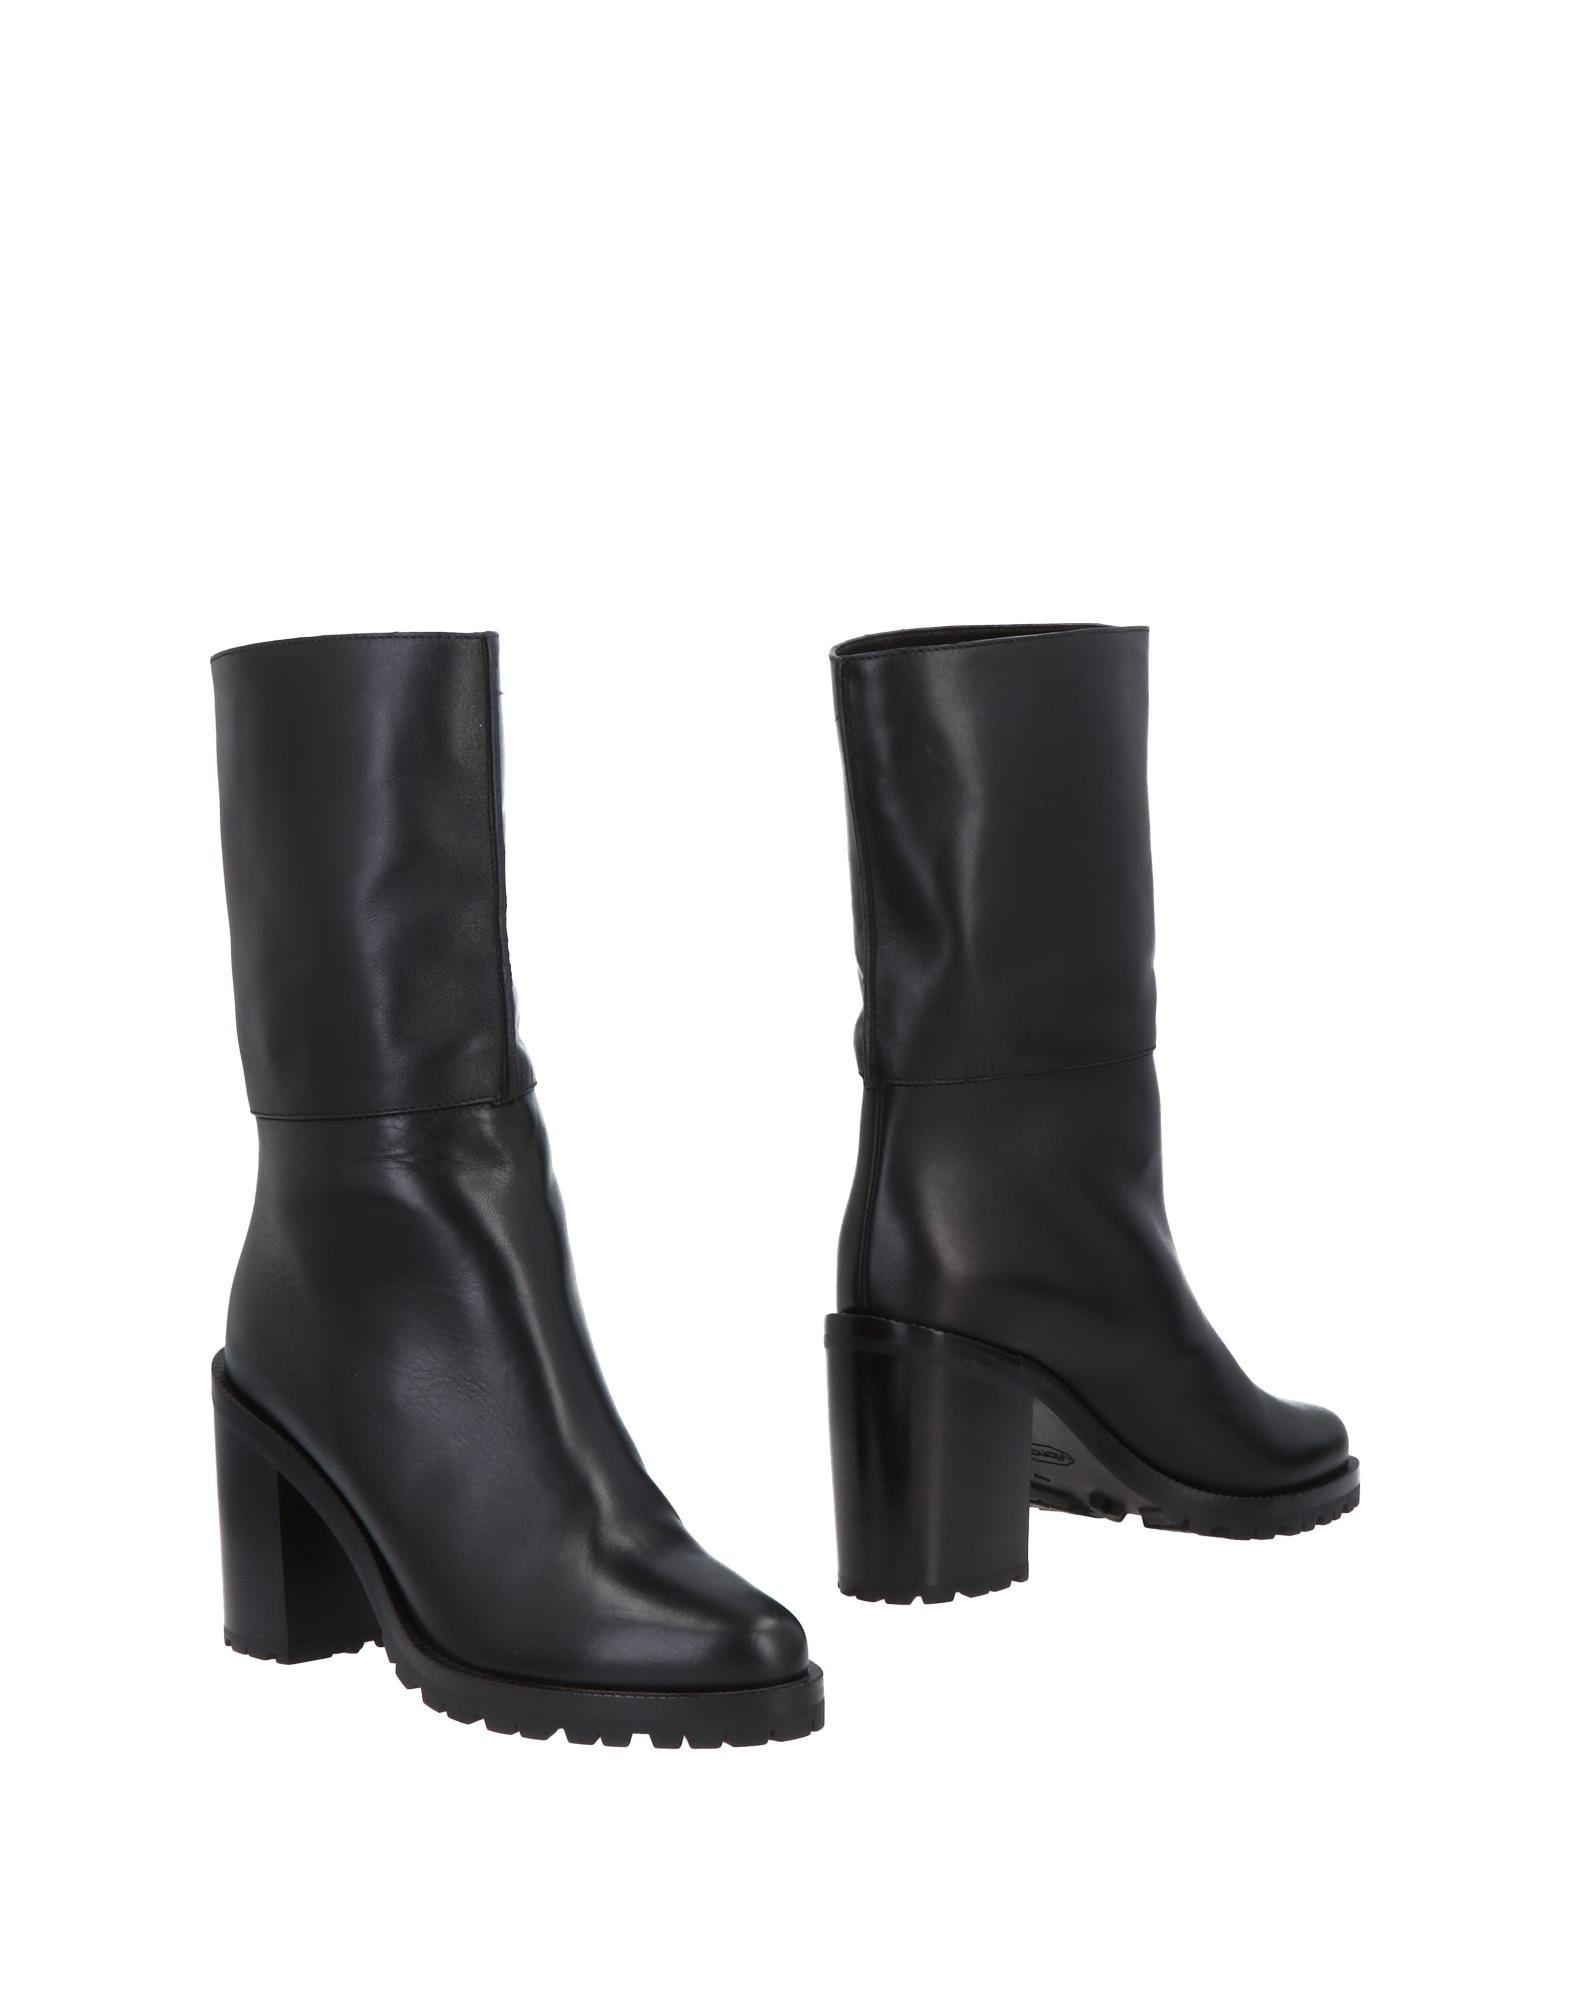 Walter Steiger Stiefelette Damen Schuhe  11500743JOGut aussehende strapazierfähige Schuhe Damen fad1f6